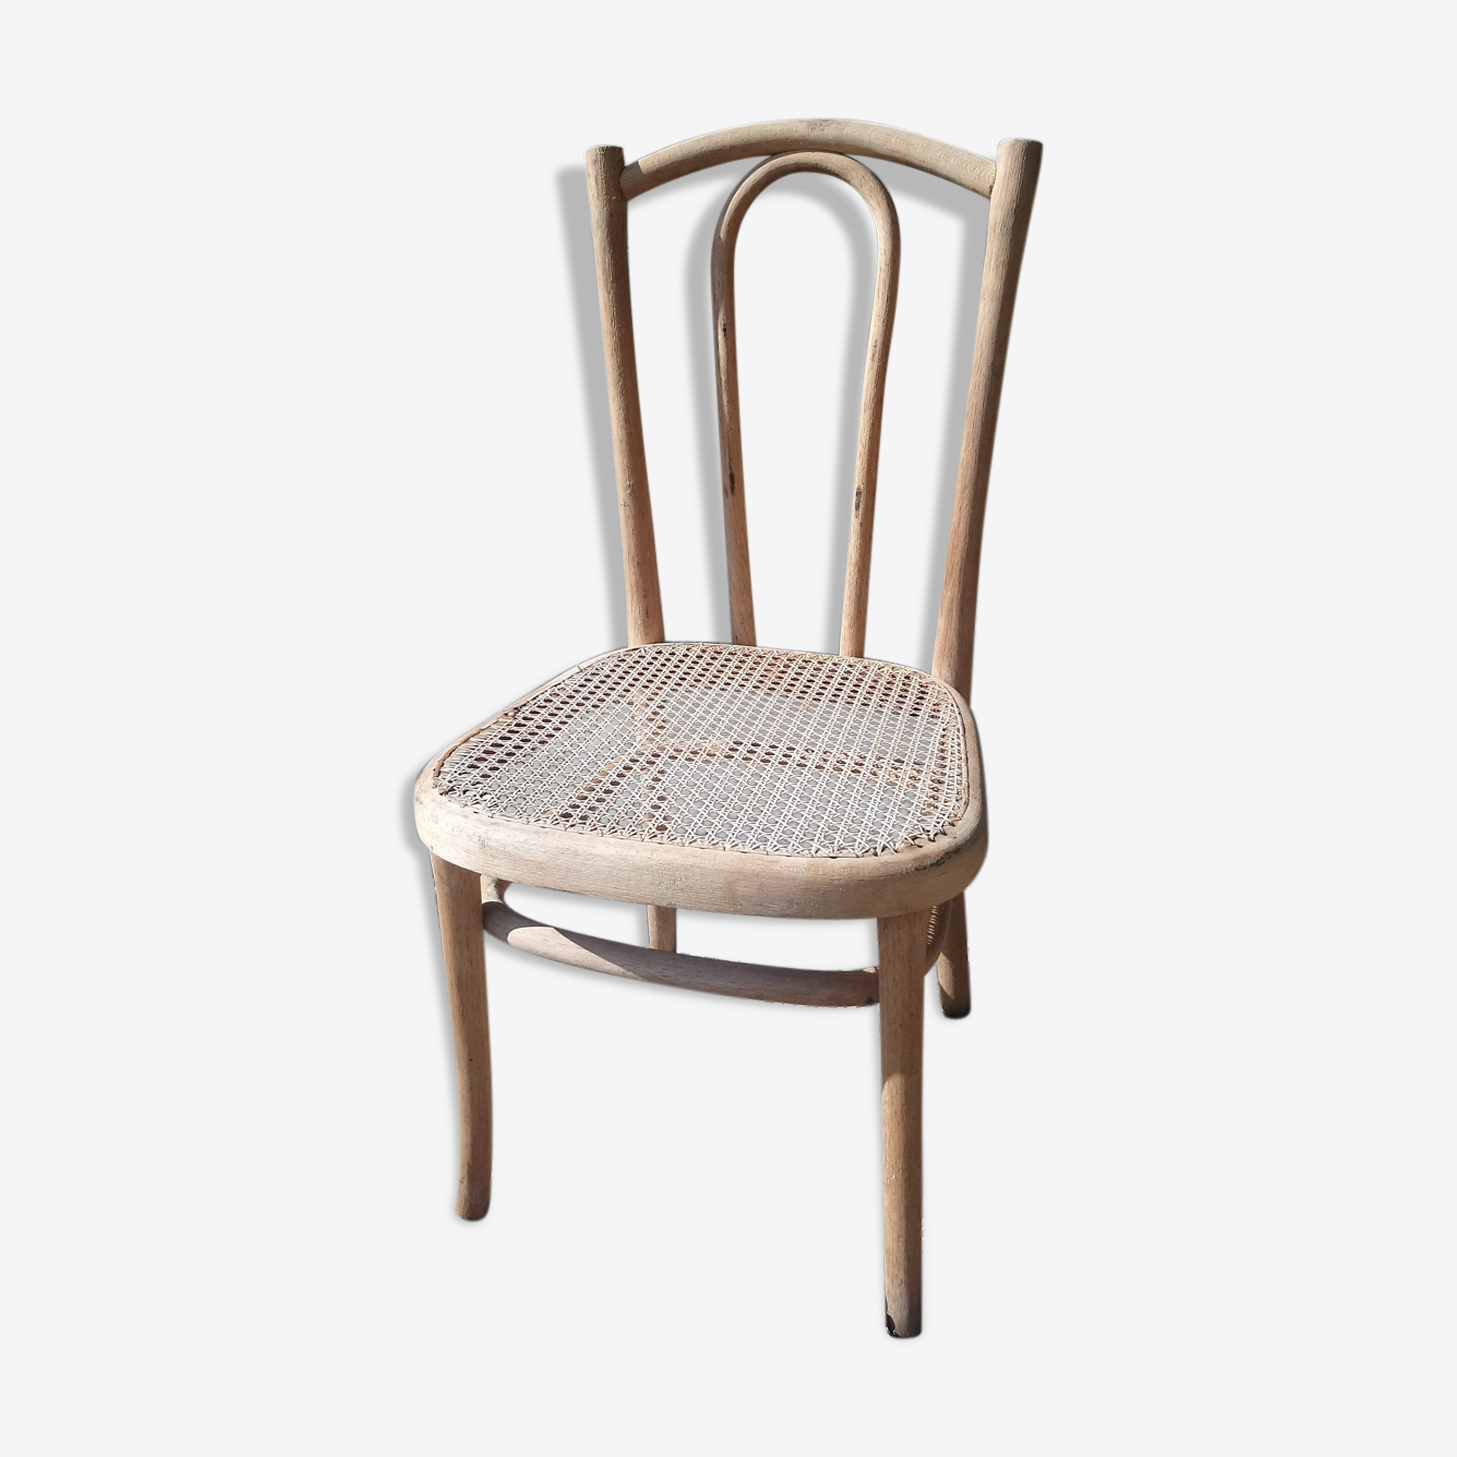 Thonet chair light wood